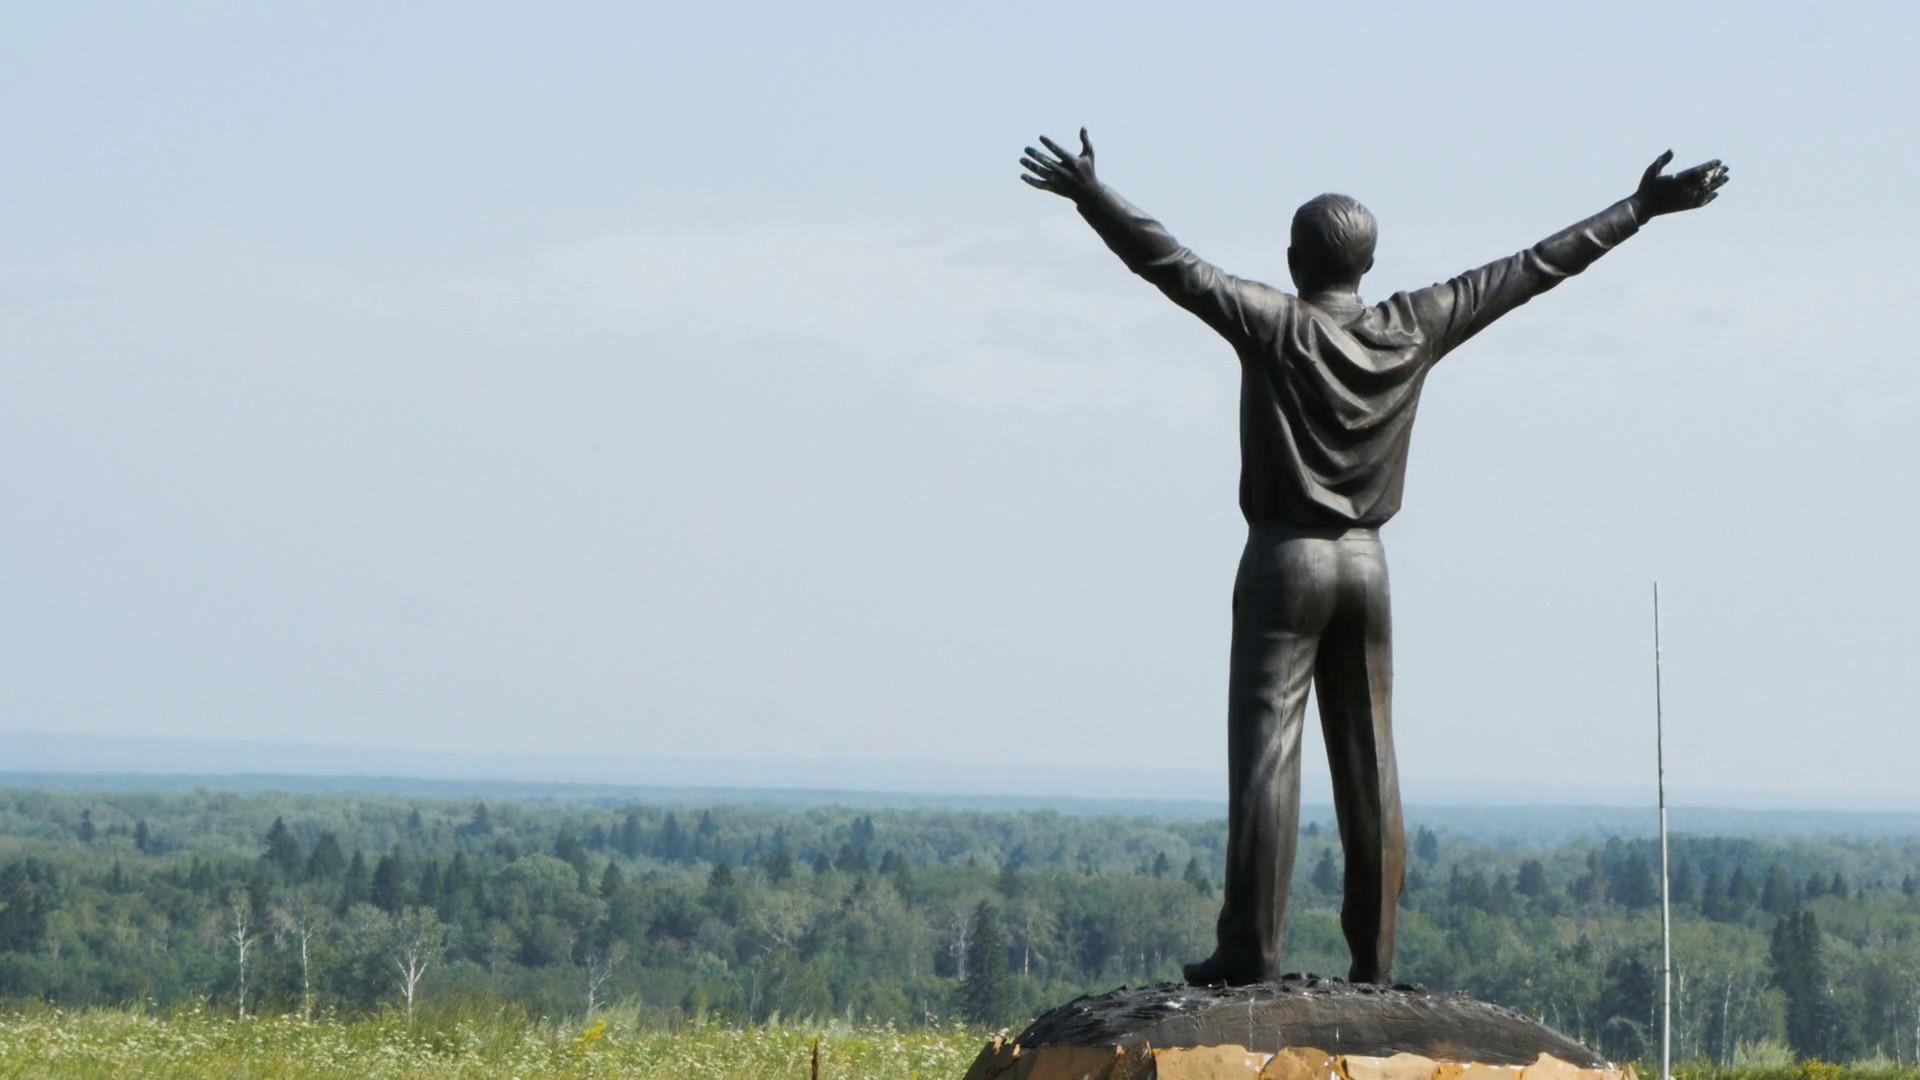 Monument to the First Cosmonaut Yuri Gagarin. Ruyan, Siberia, Russia Stock  Video Footage – VideoBlocks